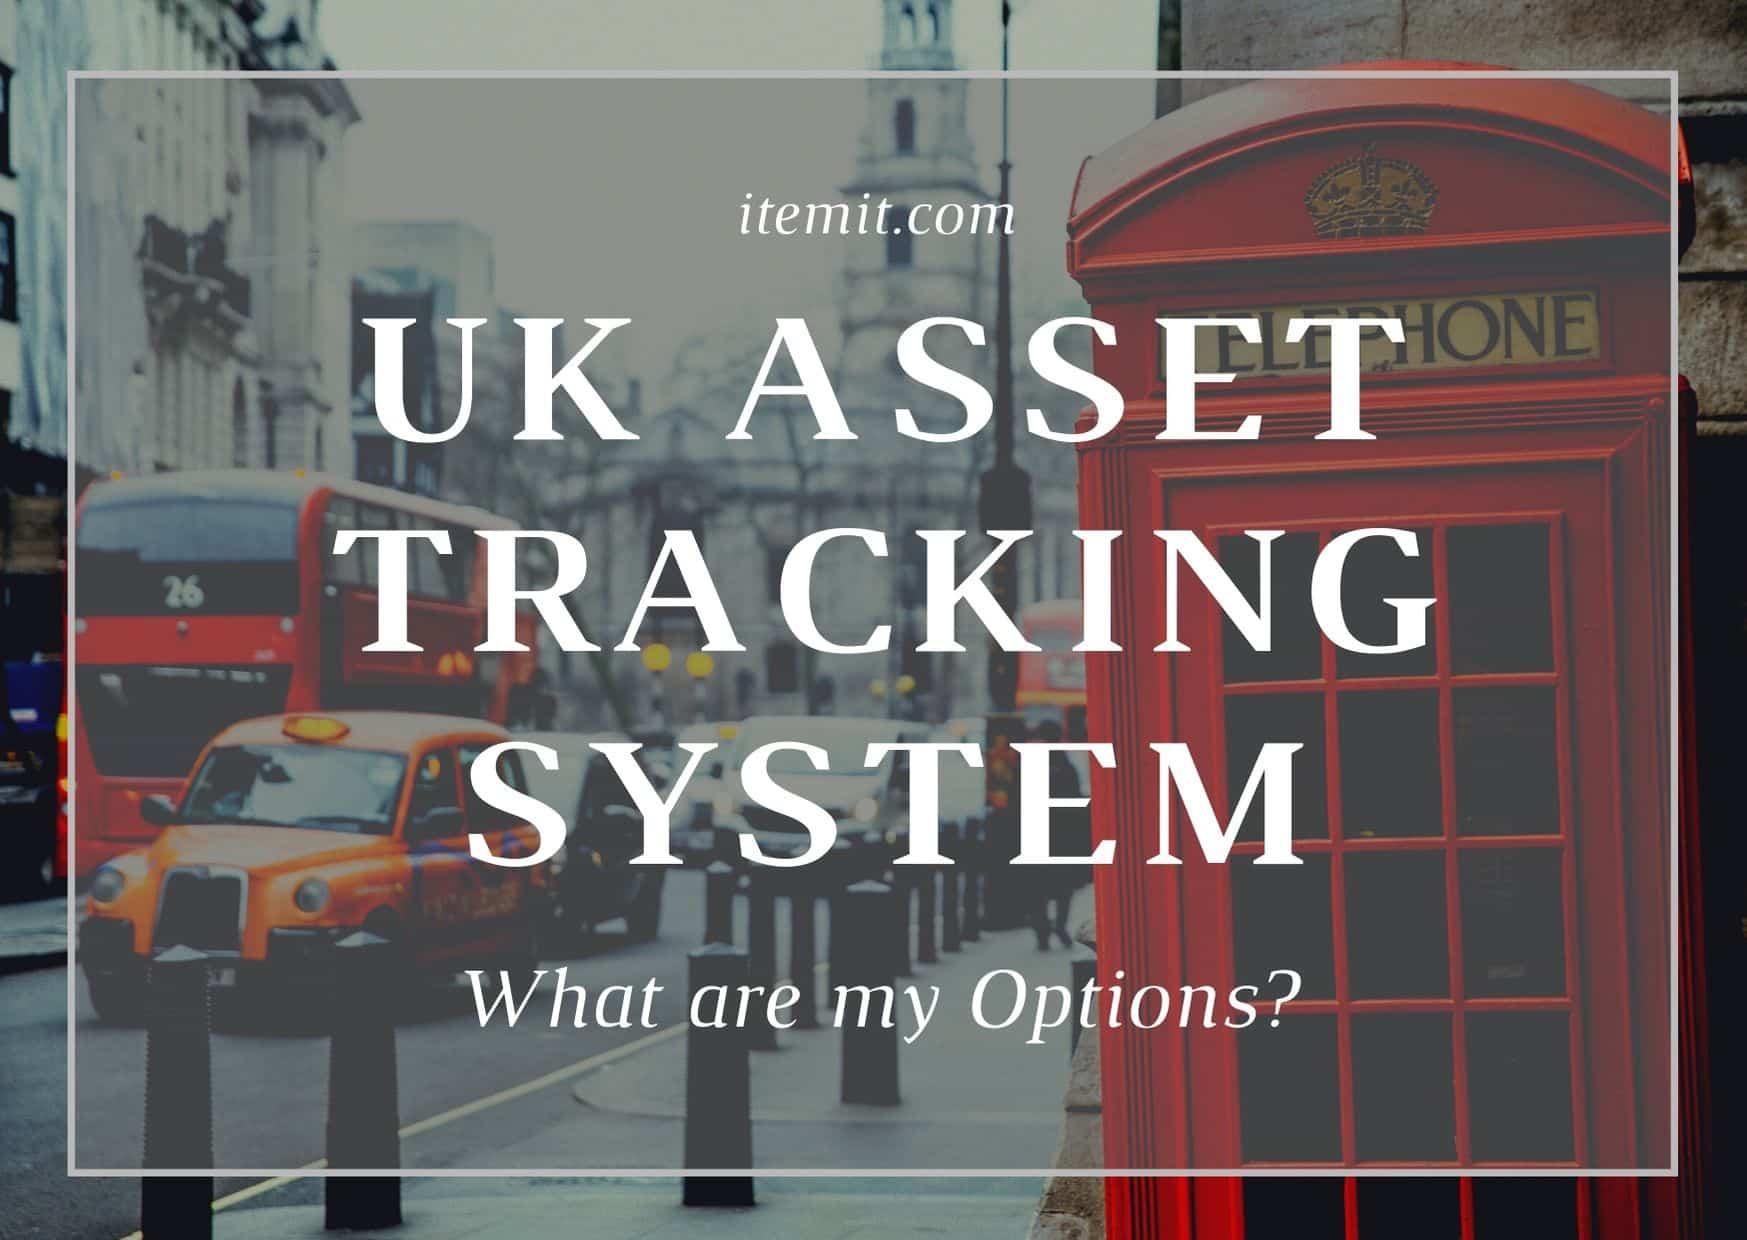 UK asset tracking system